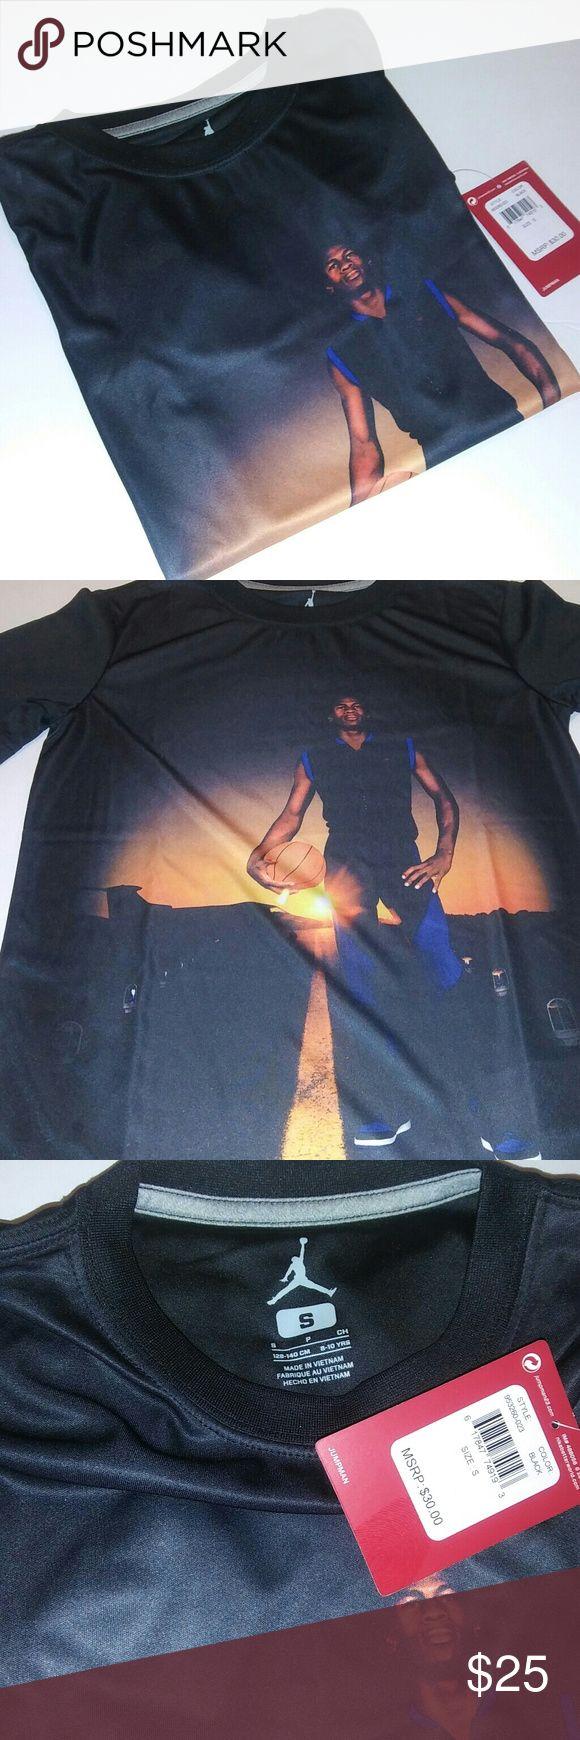 Boys Jordan Shirt Boys black 100% polyester Jordan shirt. The front of the shirt displays Michael Jordan and the back of the shirt is solid black. This is an amazing shirt for Jordan fans!   Size: S Jordan Shirts & Tops